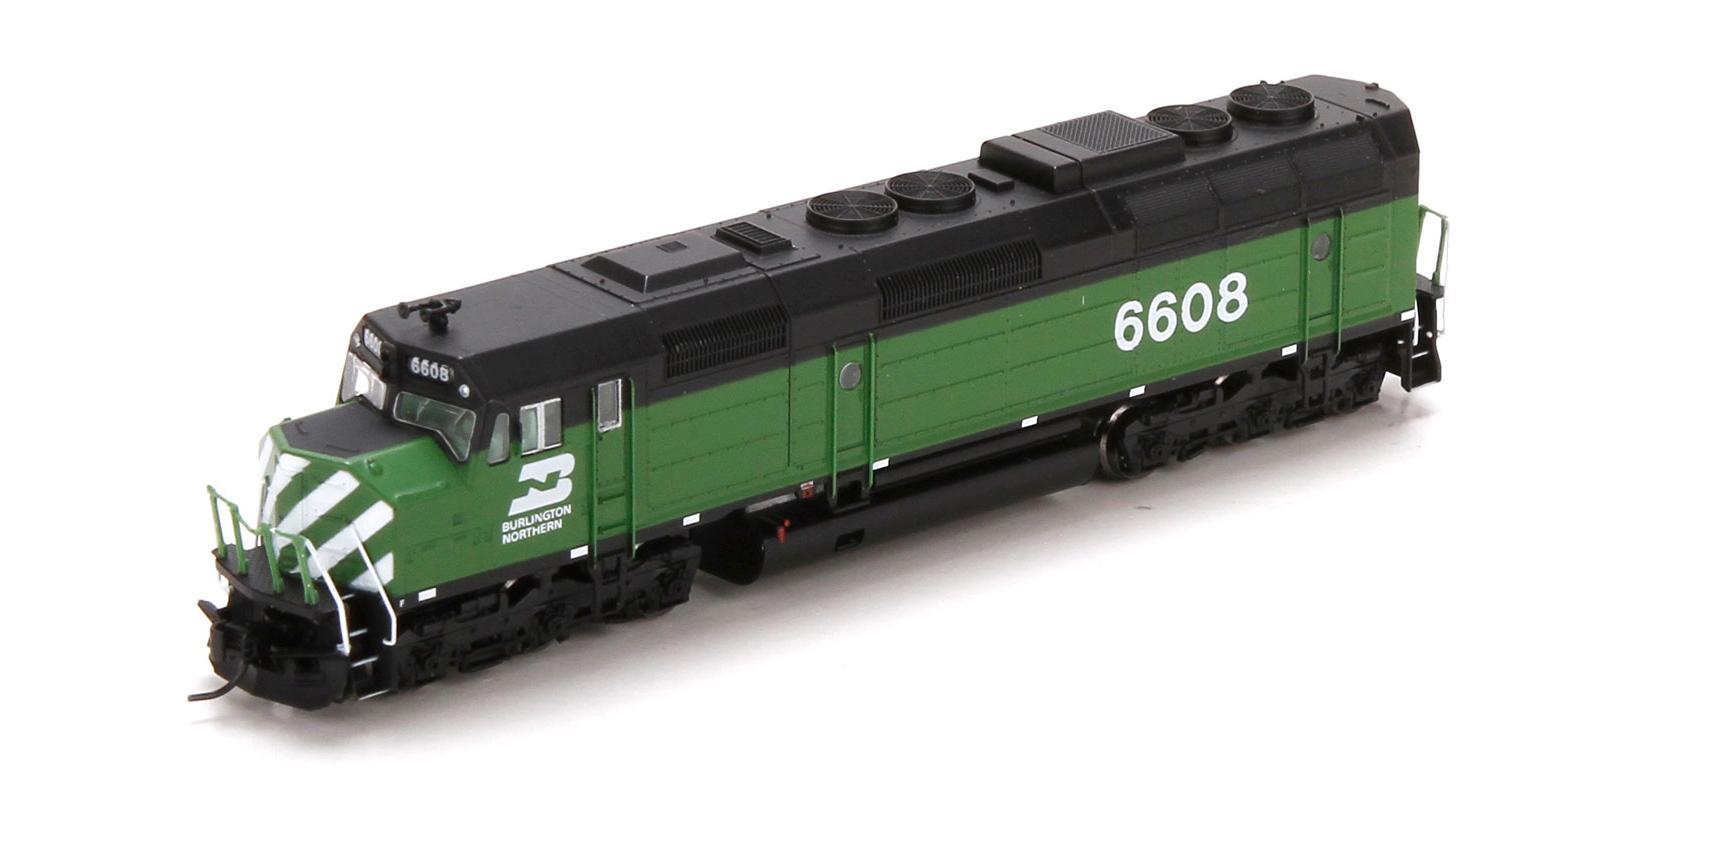 N Scale - Athearn - 22470 - Locomotive, Diesel, EMD F45 - Burlington Northern - 6608